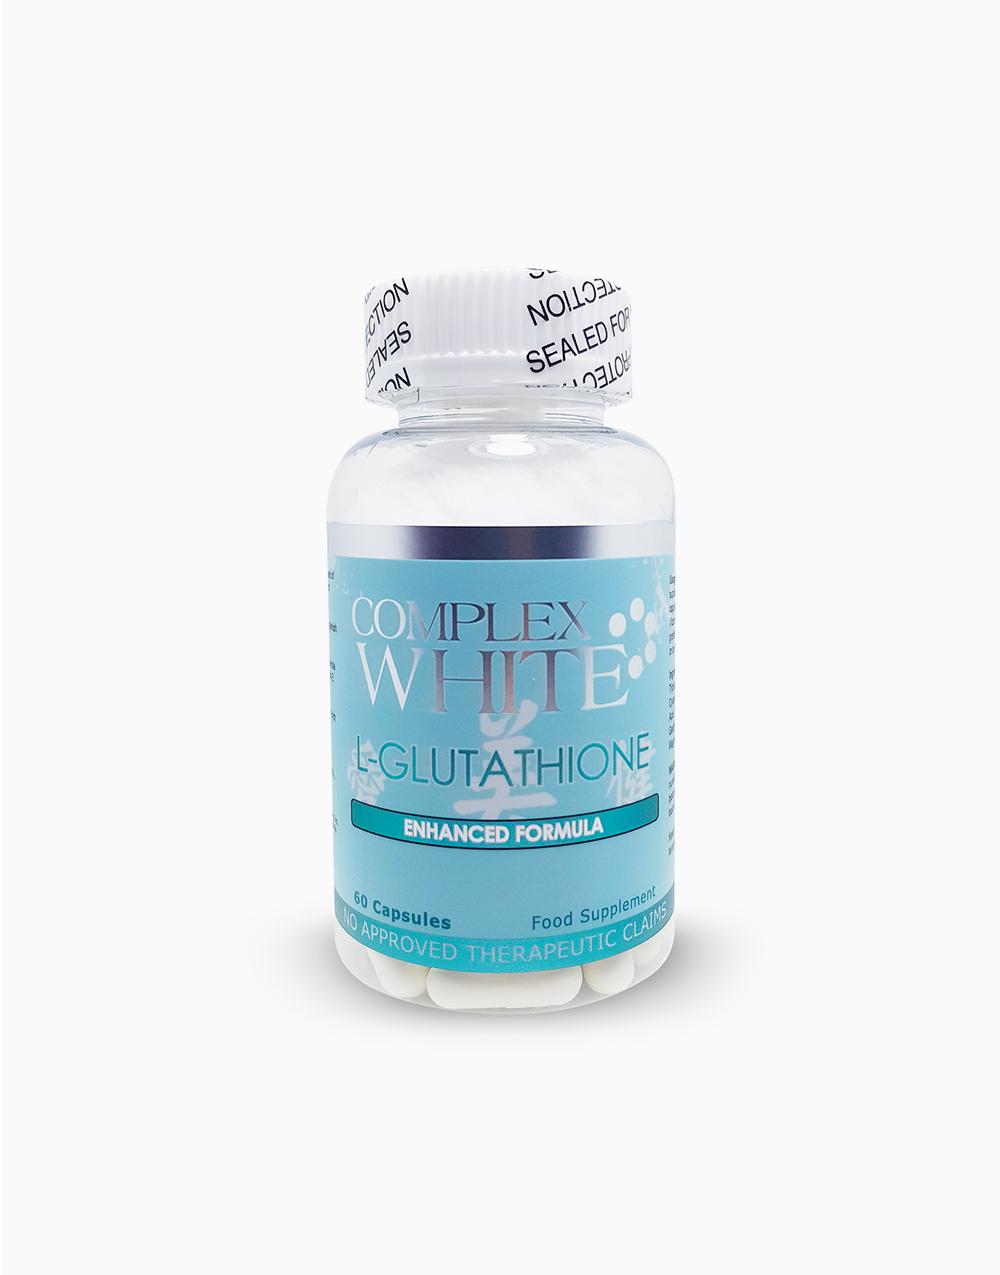 L-Glutathione Capsules (60 capsules) by Complex White